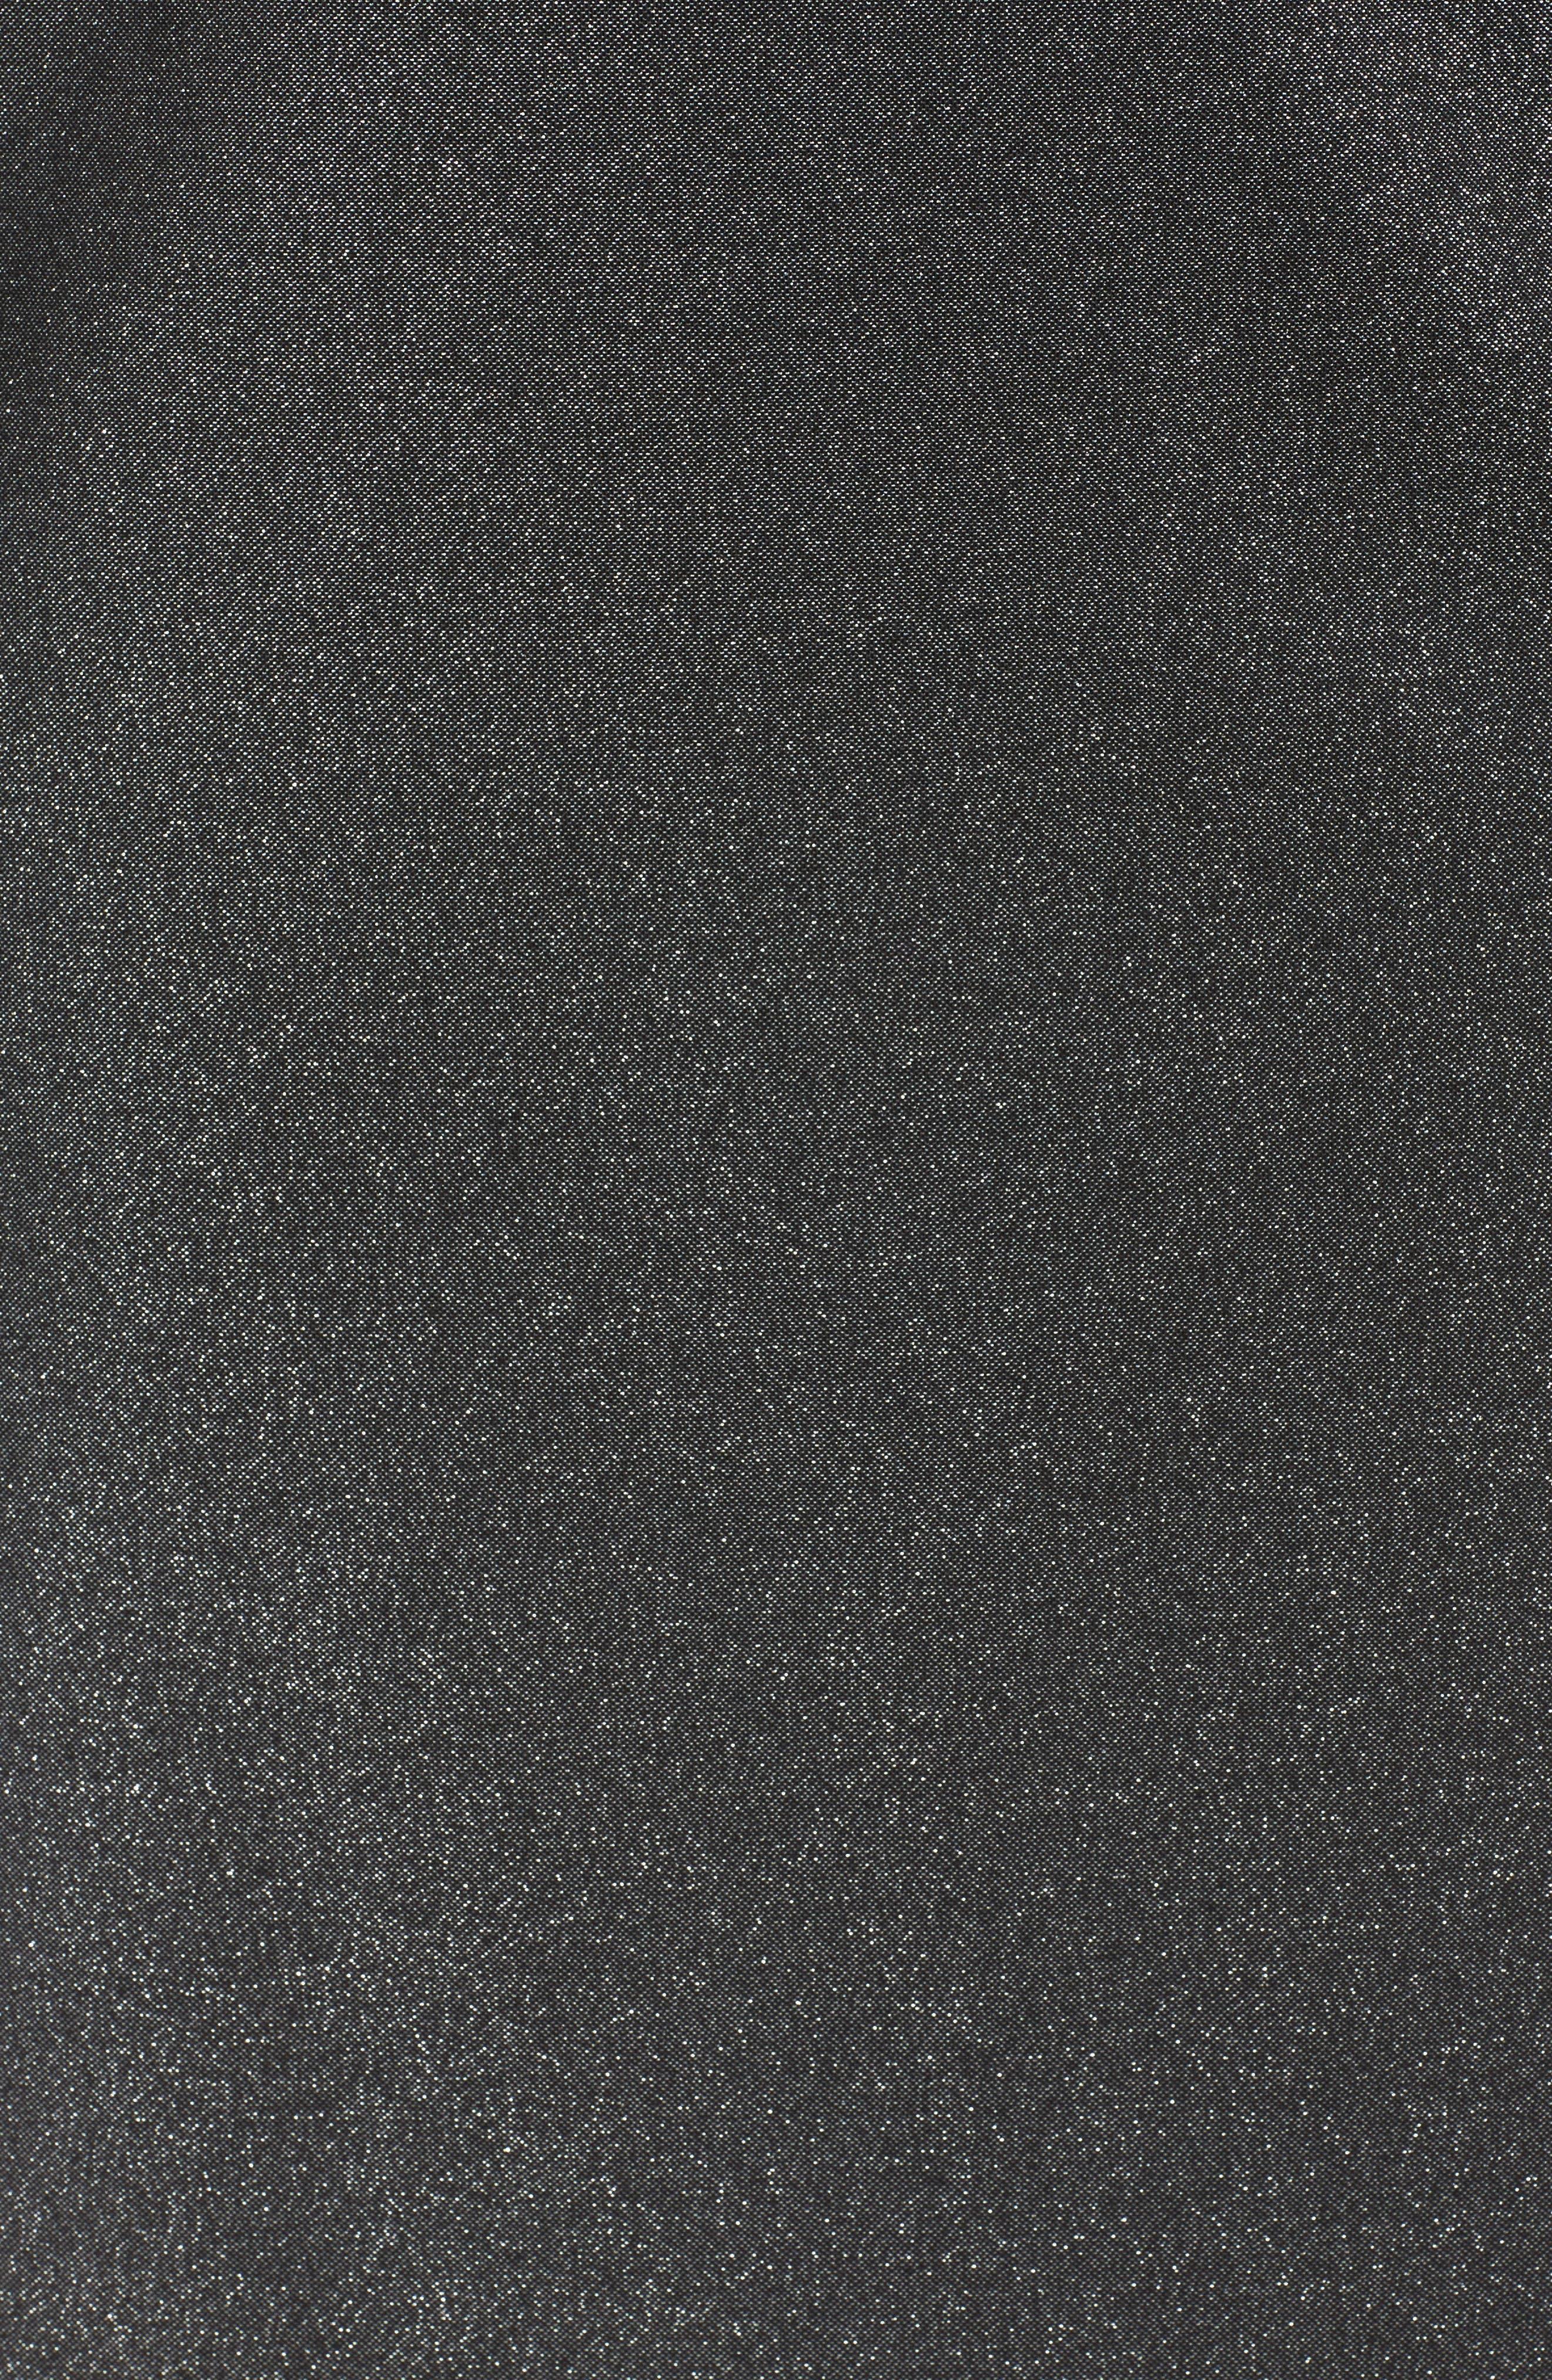 Off the Shoulder Metallic Sheath Dress,                             Alternate thumbnail 5, color,                             Rich Black